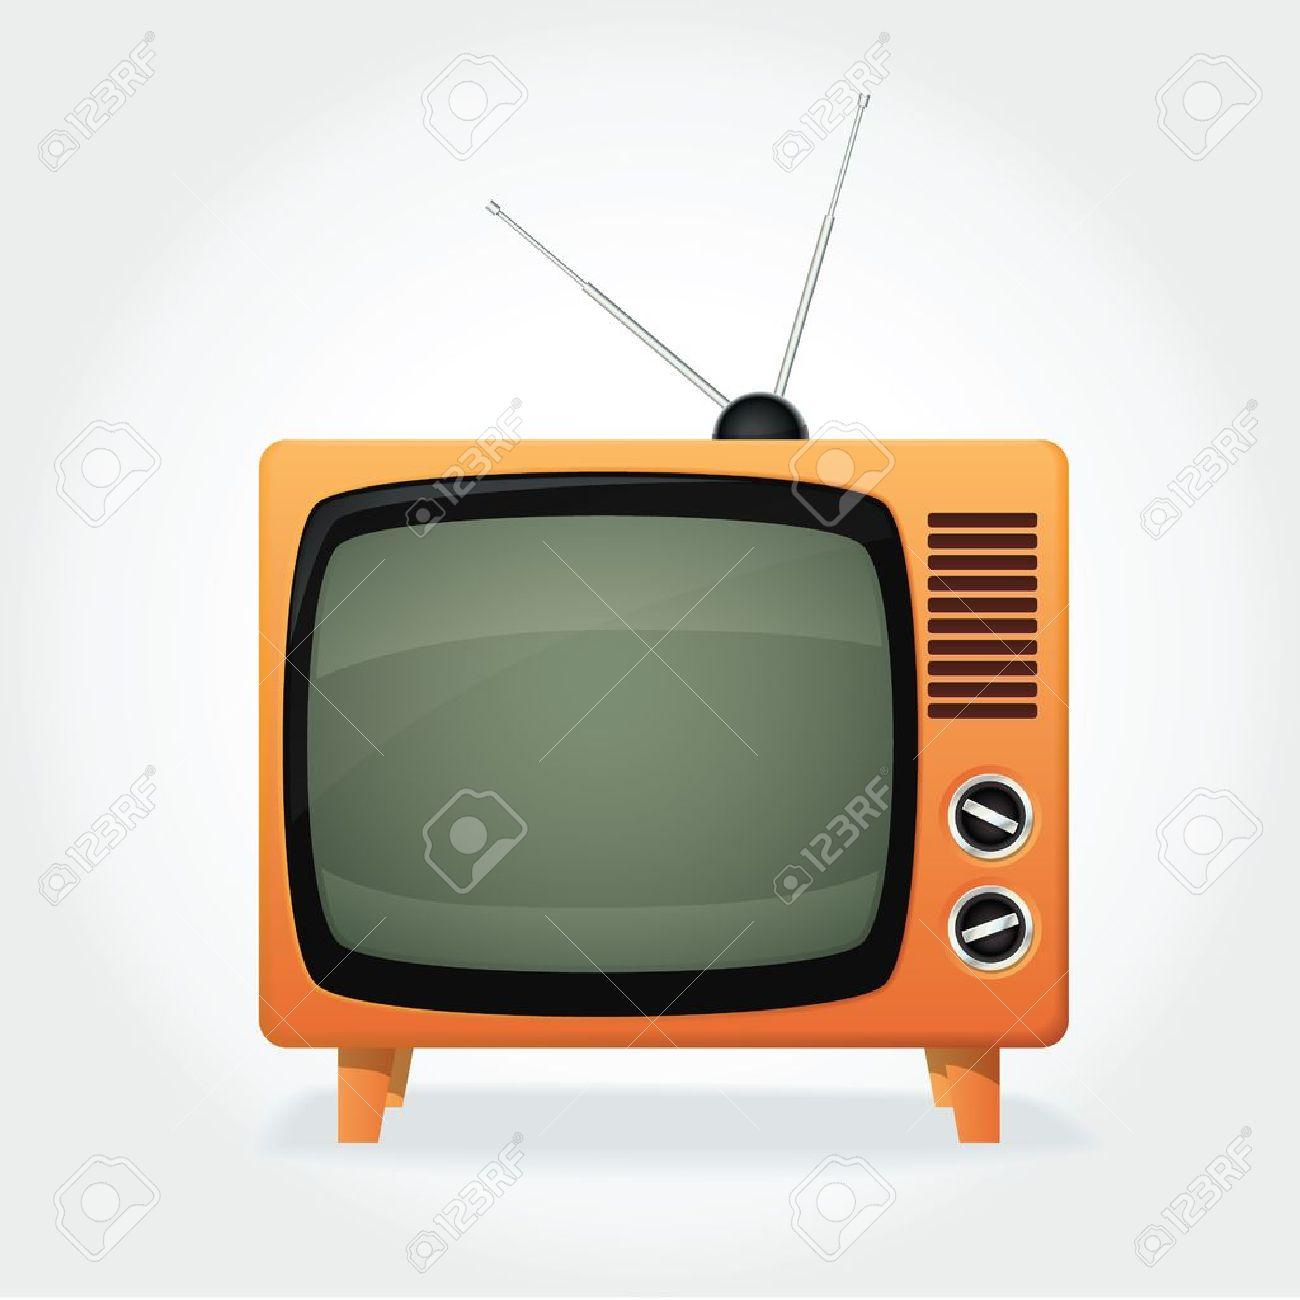 CUte retro TV set, orange cover and tiny antenna Stock Vector - 15630849